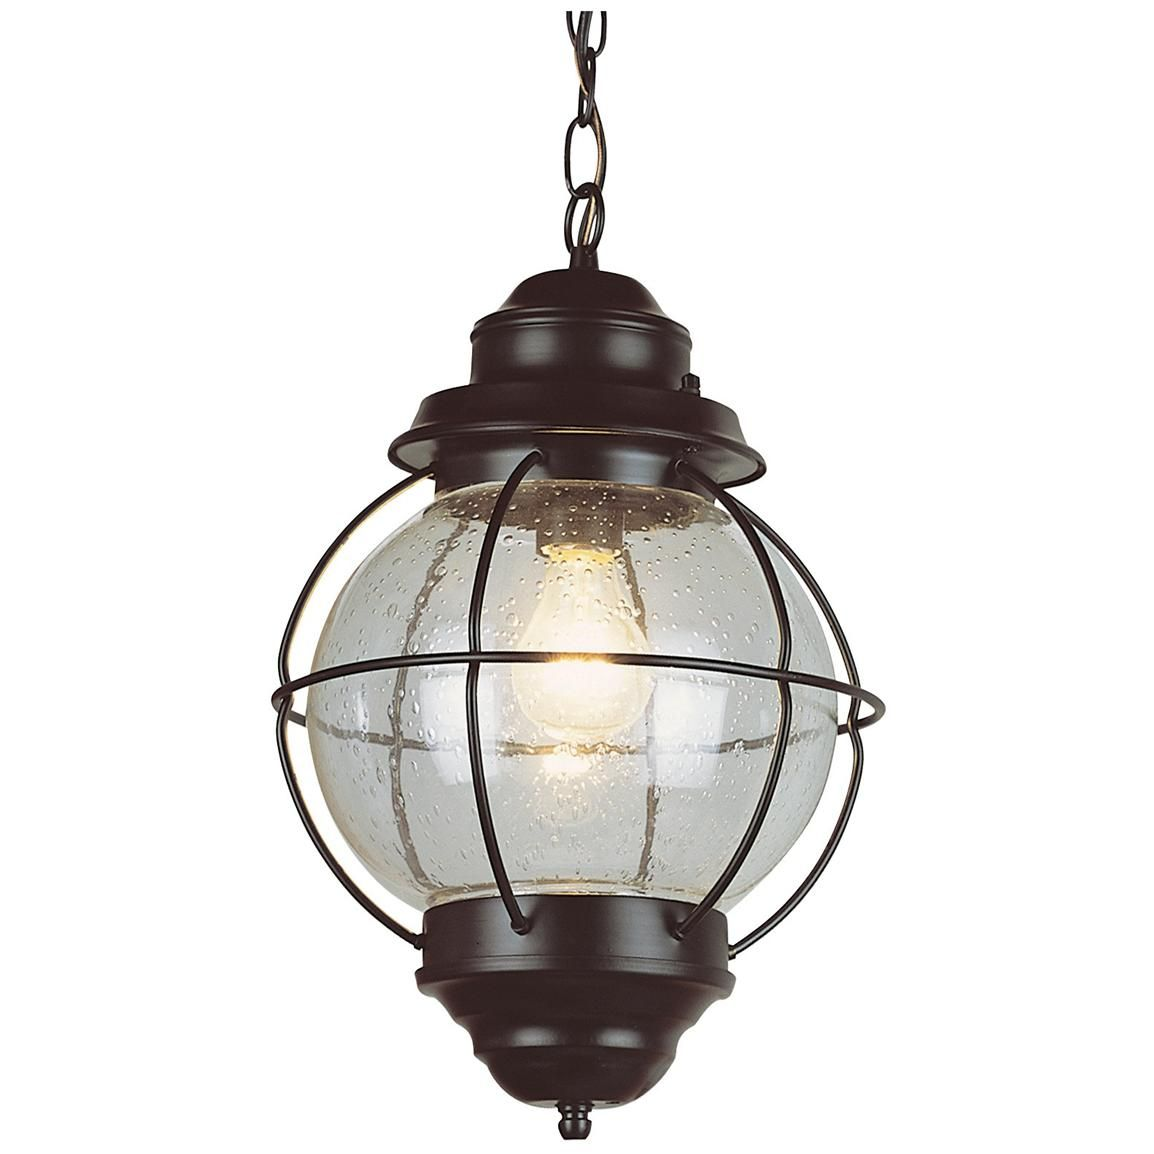 Nautical hanging globe lantern things that dont fit in an earthen trans globe lighting 69903 bk 1 light hanging lantern in black hanging onion lantern in black arubaitofo Gallery